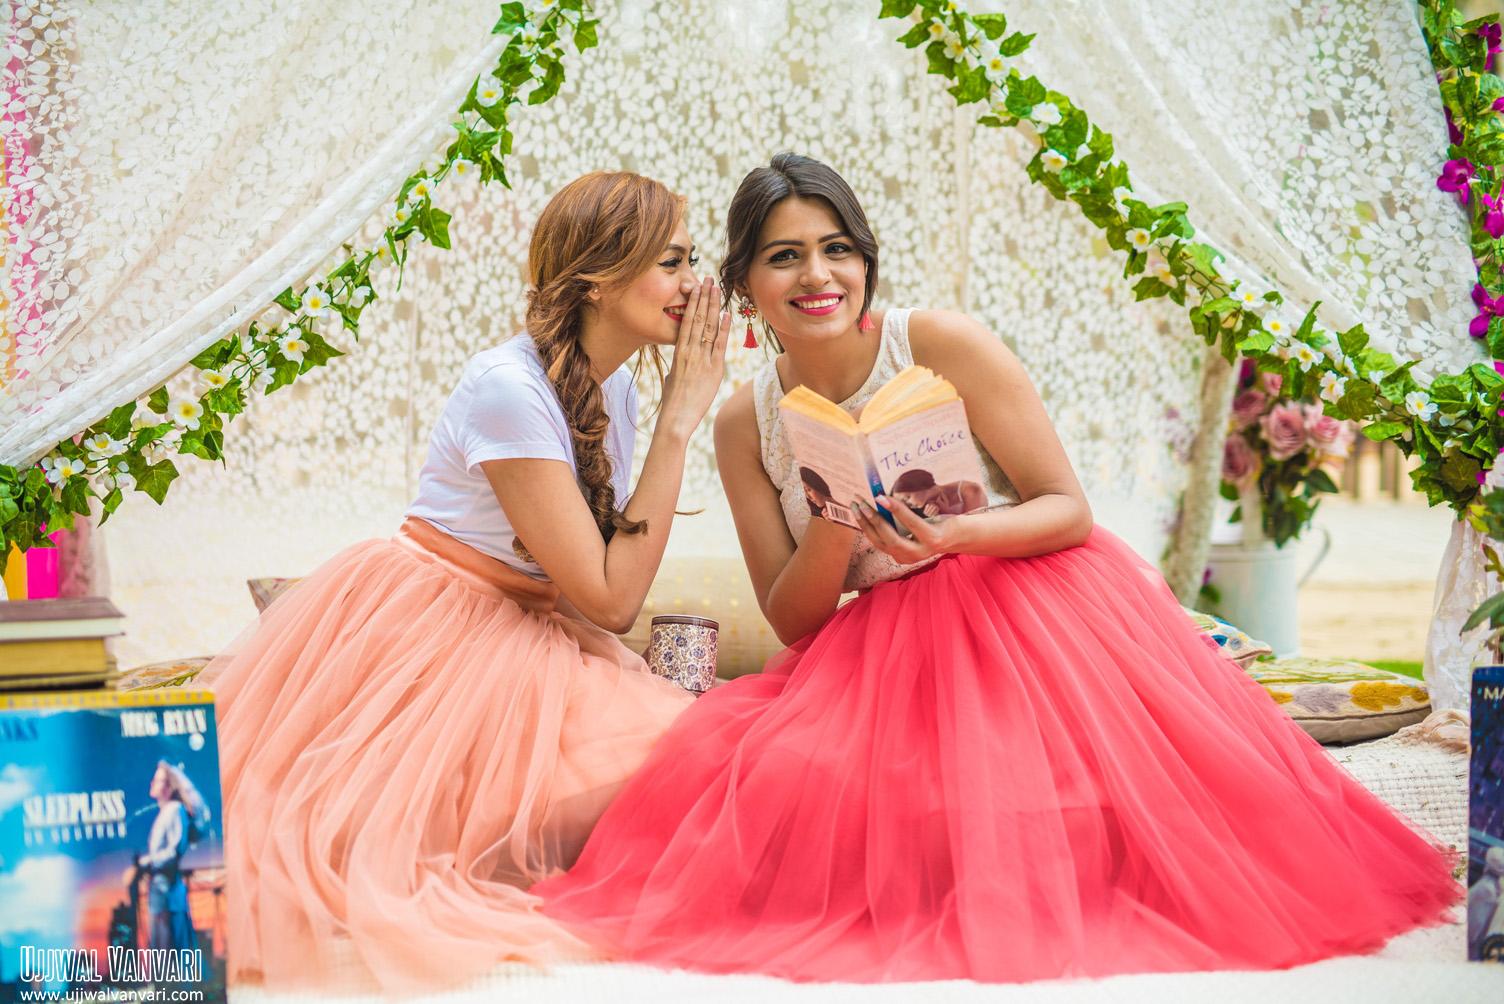 The Perfect Location | Fashion Photography | Dixika Vanvari Withlovemissd | Ashima Makhija Colorsnglitters